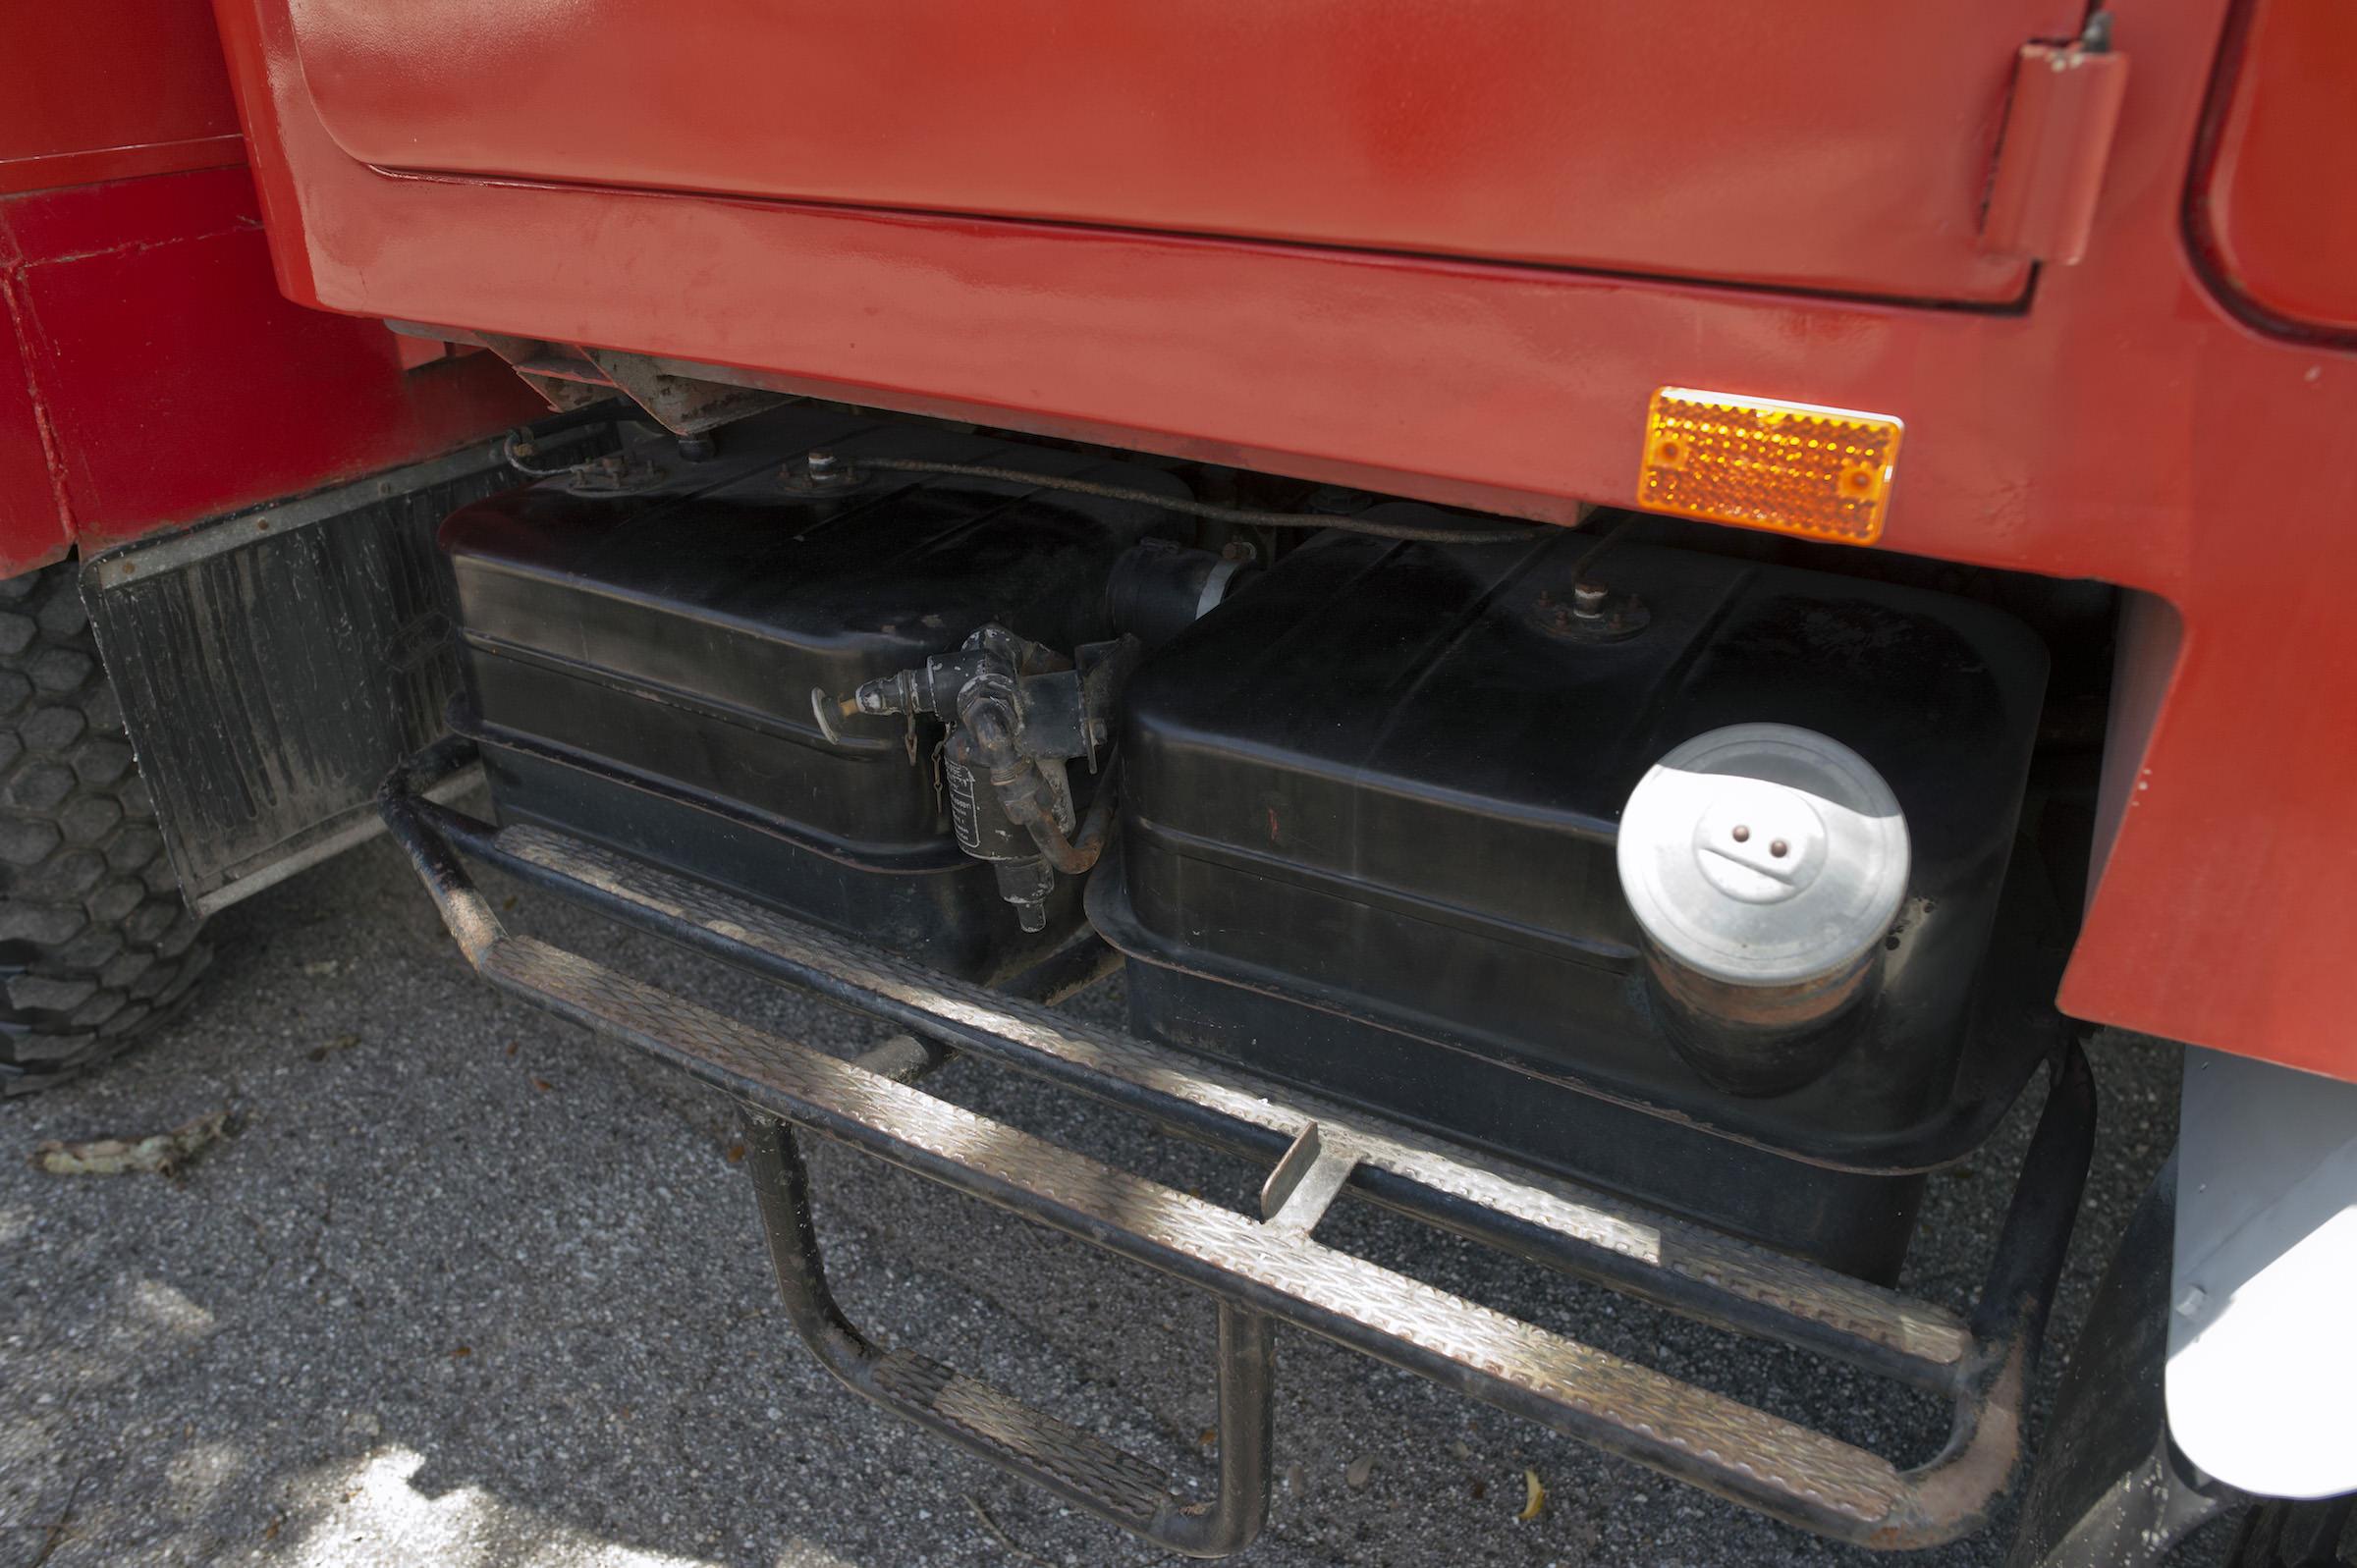 Mercedes Benz Unimog Fuel Tank 1968 mercedes benz unimog 404 mountain rescue fire truck